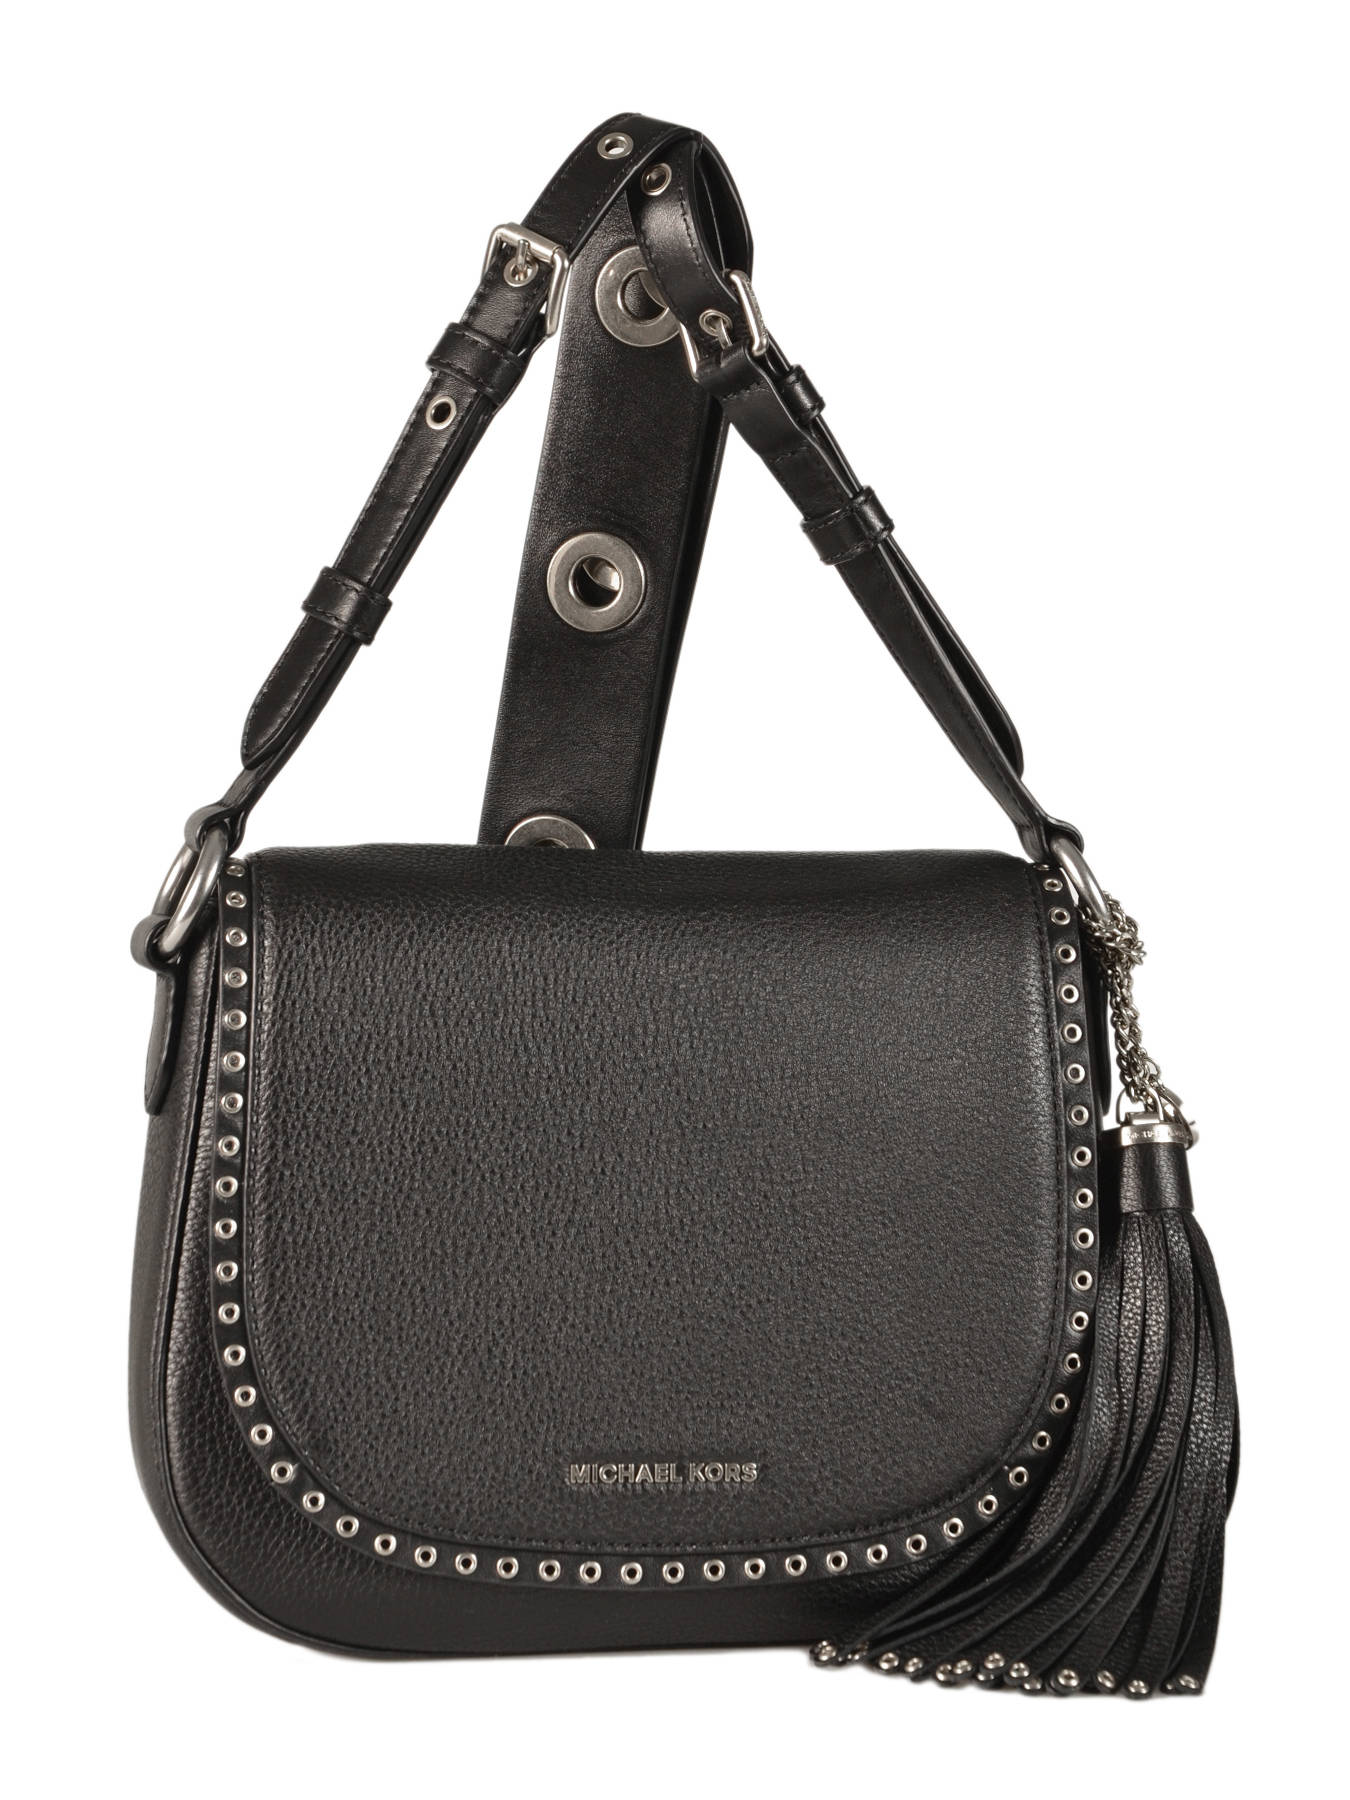 black and gray michael kors bag 2tin  Crossbody Bag Brooklyn Leather Michael kors Black brooklyn F6ABNM2L